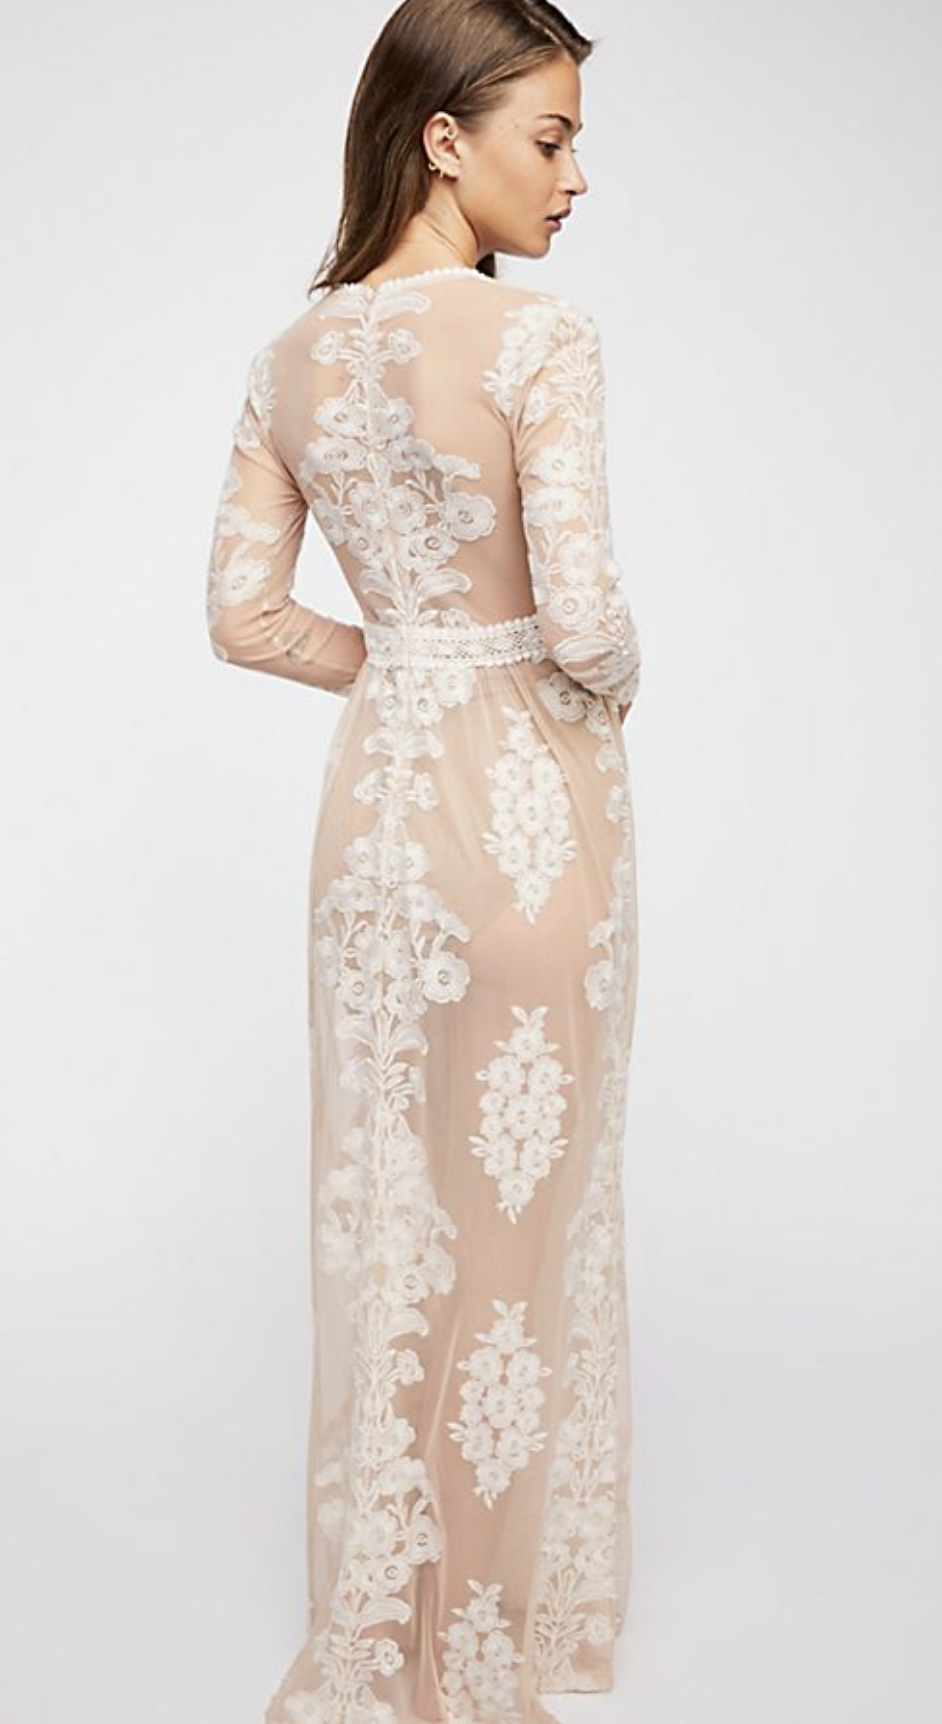 Temecula Maxi Dress - $250